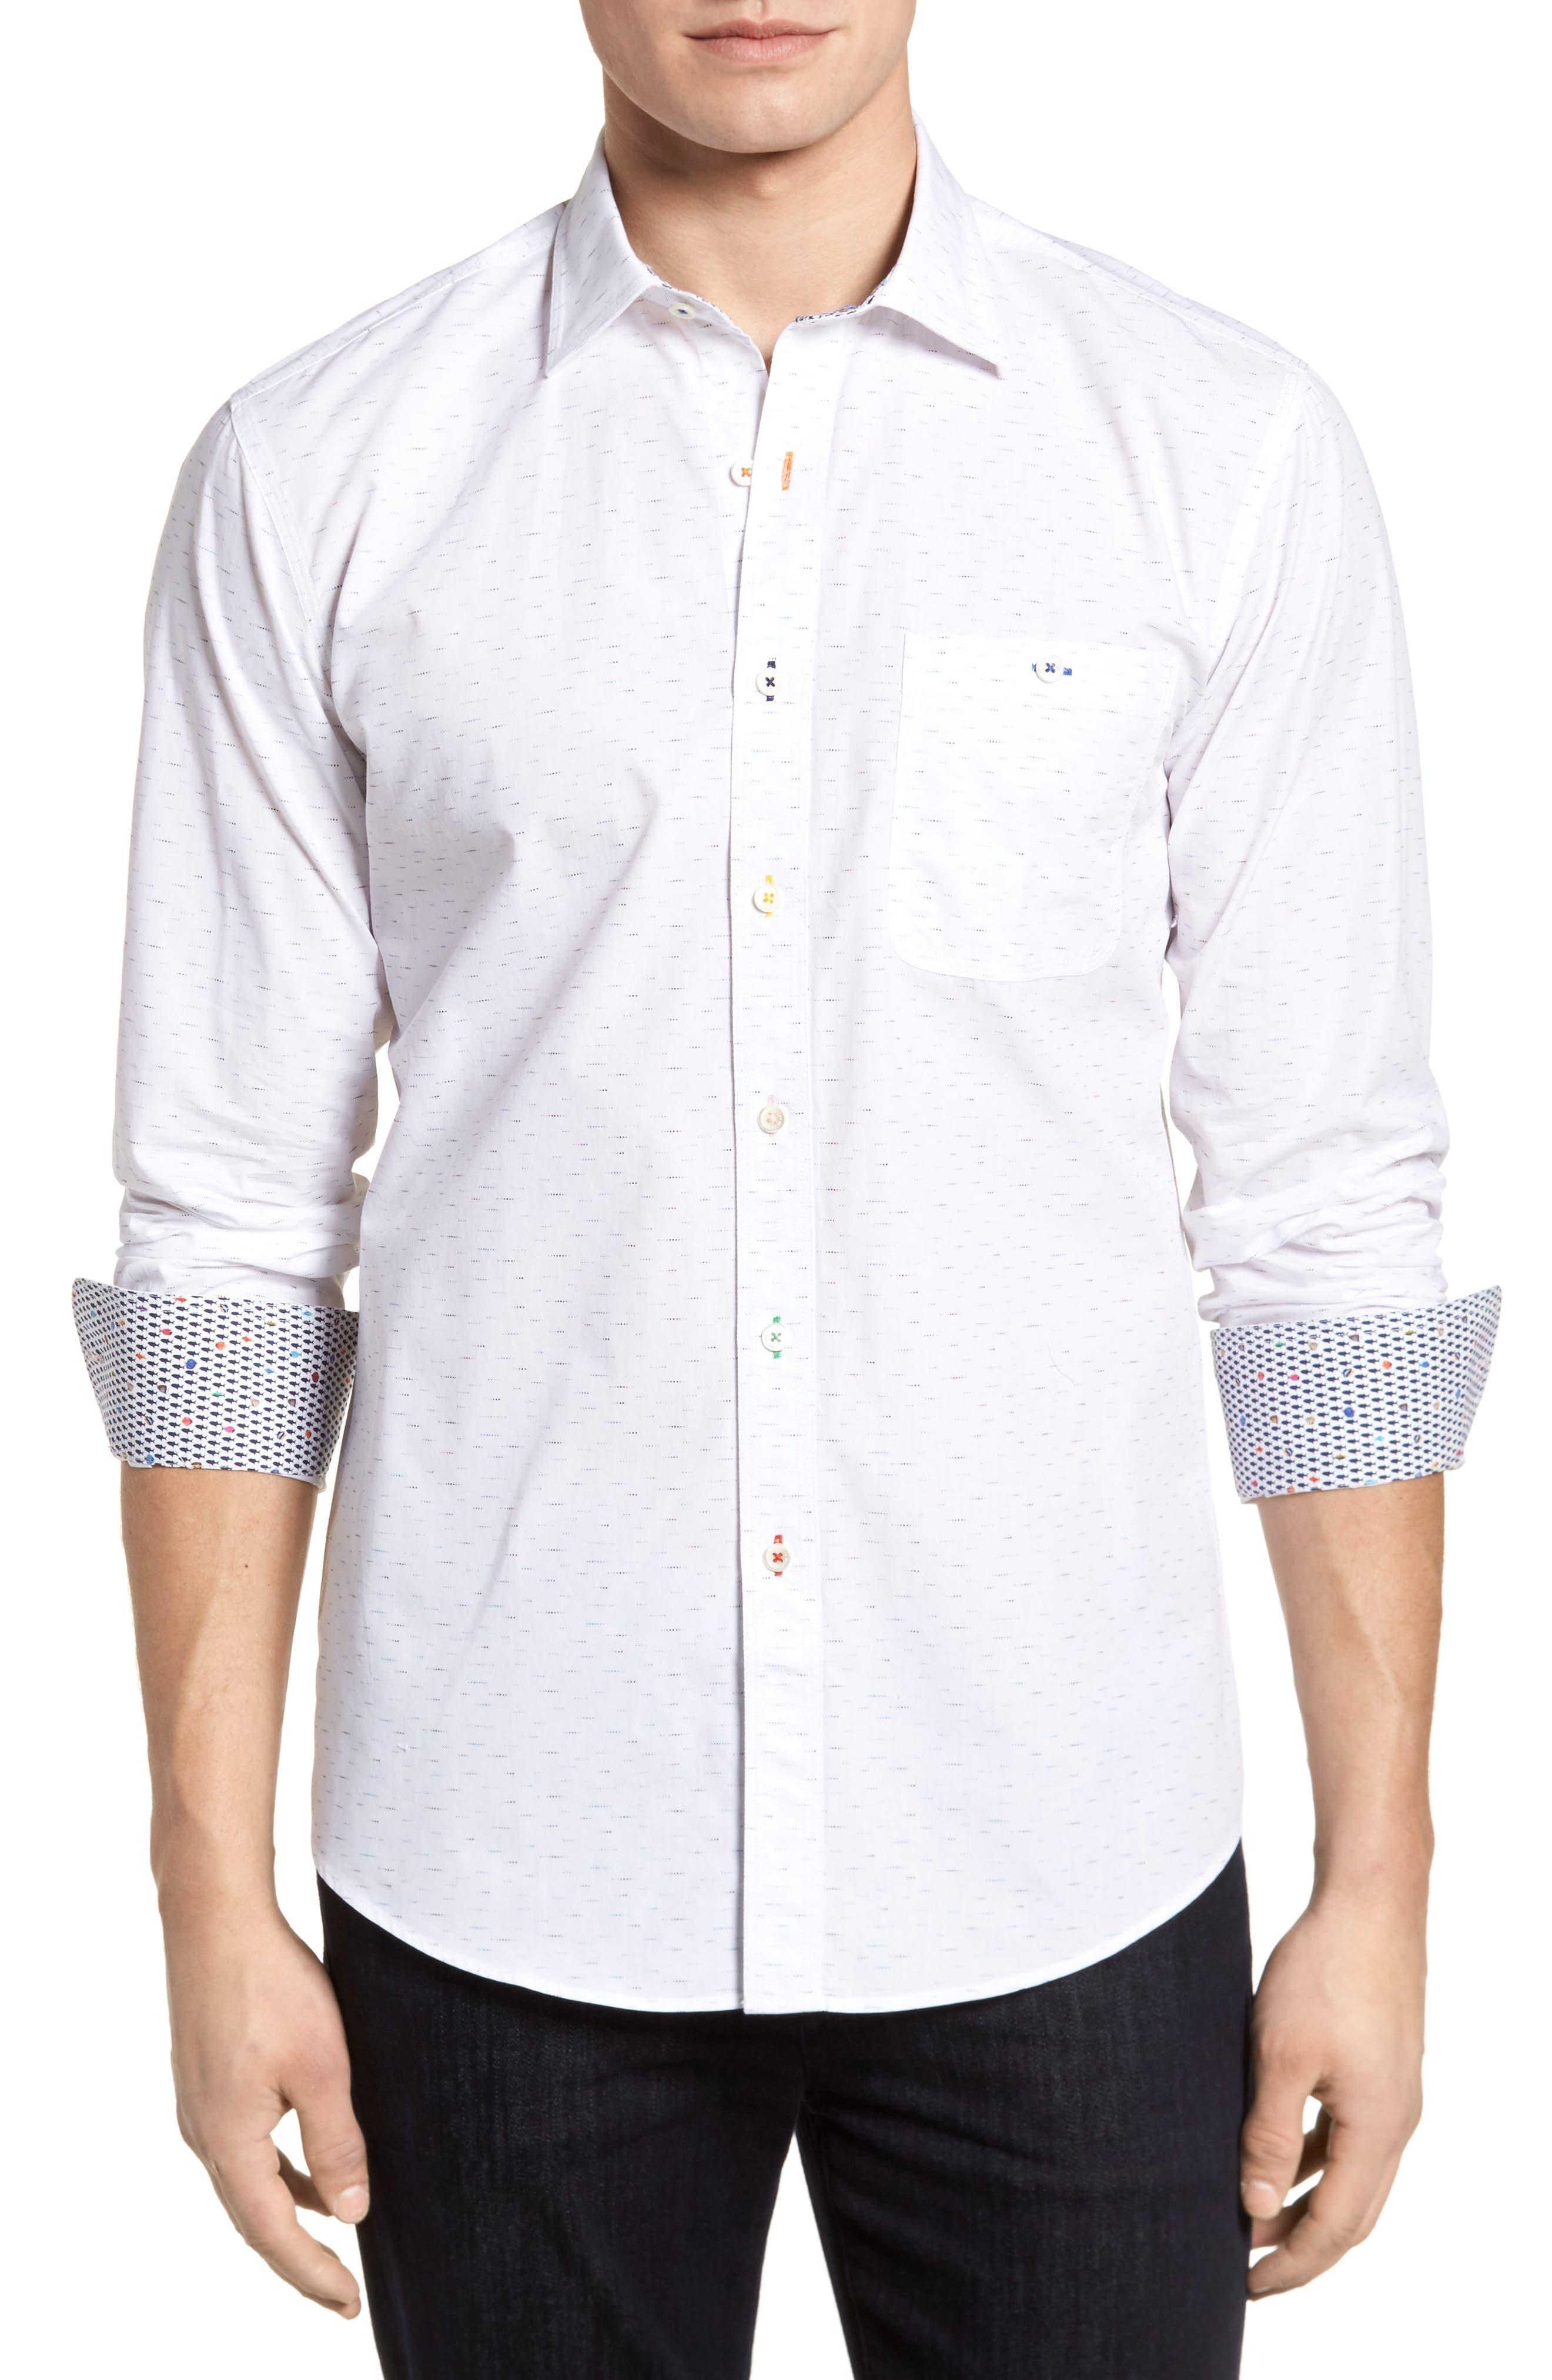 Dots Etc. Shaped Fit Sport Shirt,                             Main thumbnail 1, color,                             Chalk